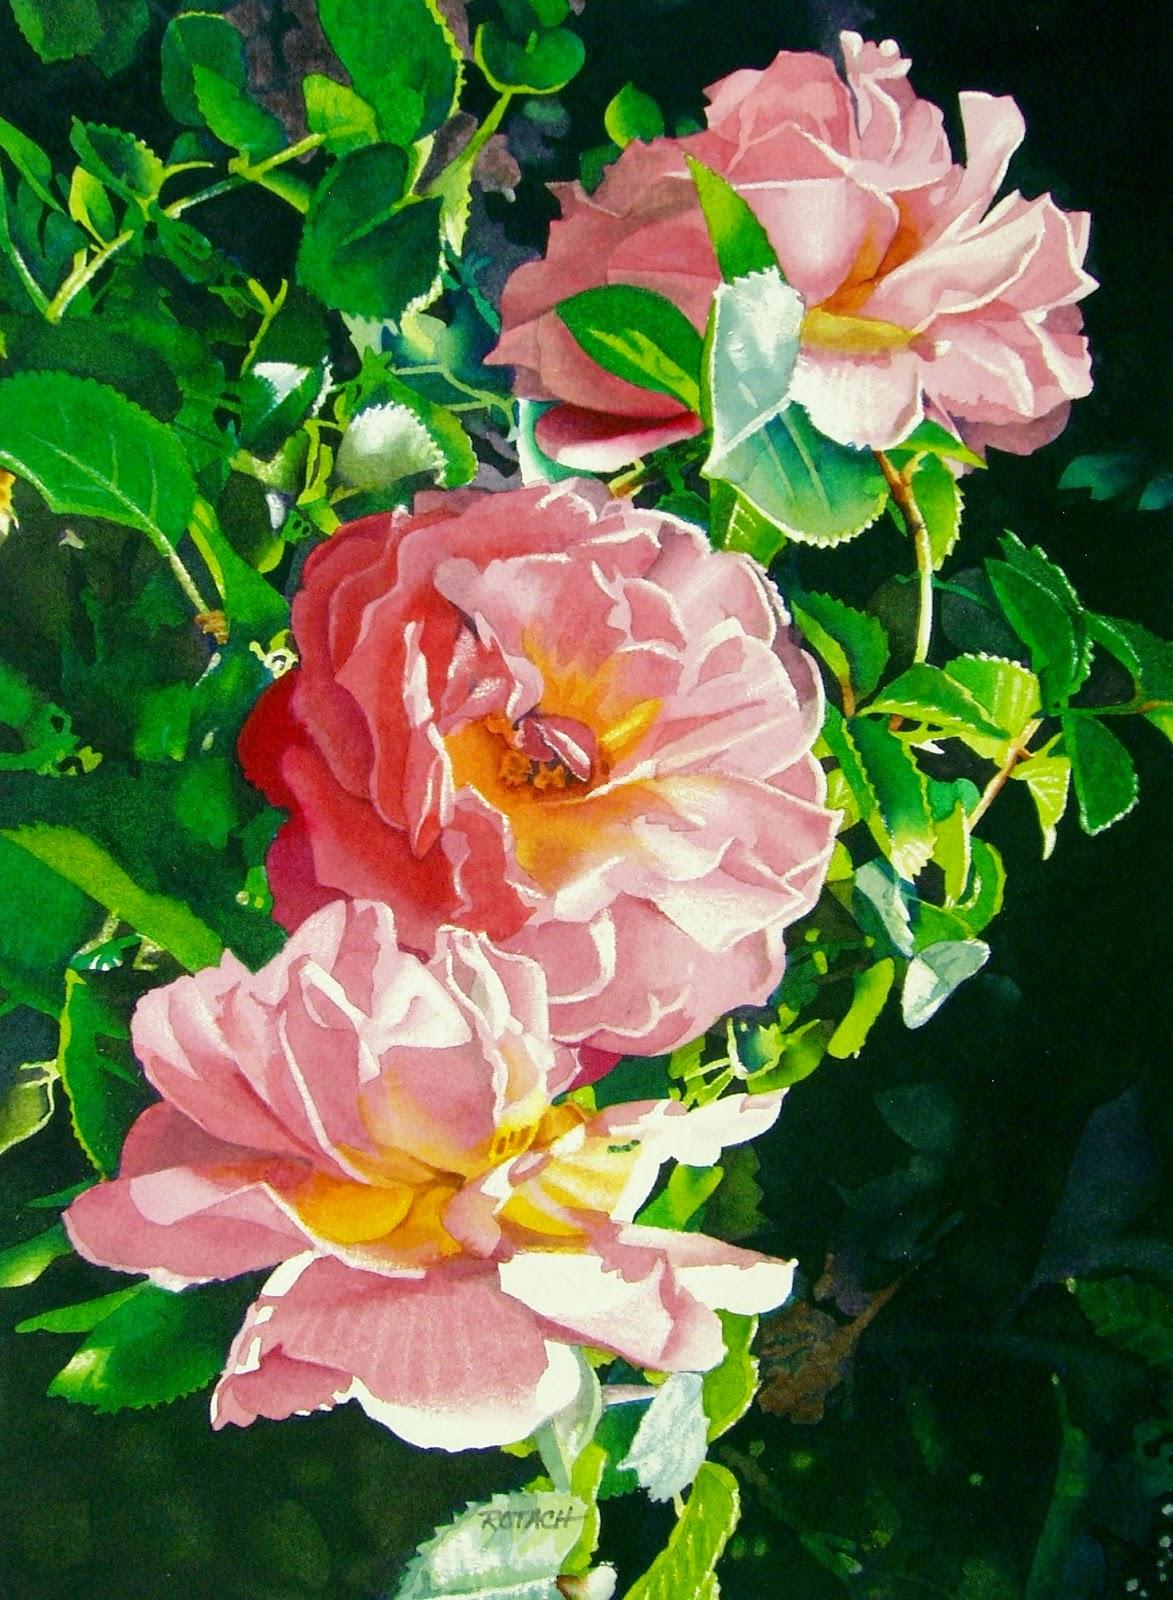 pintura-de-flores-naturales-en-acuarela